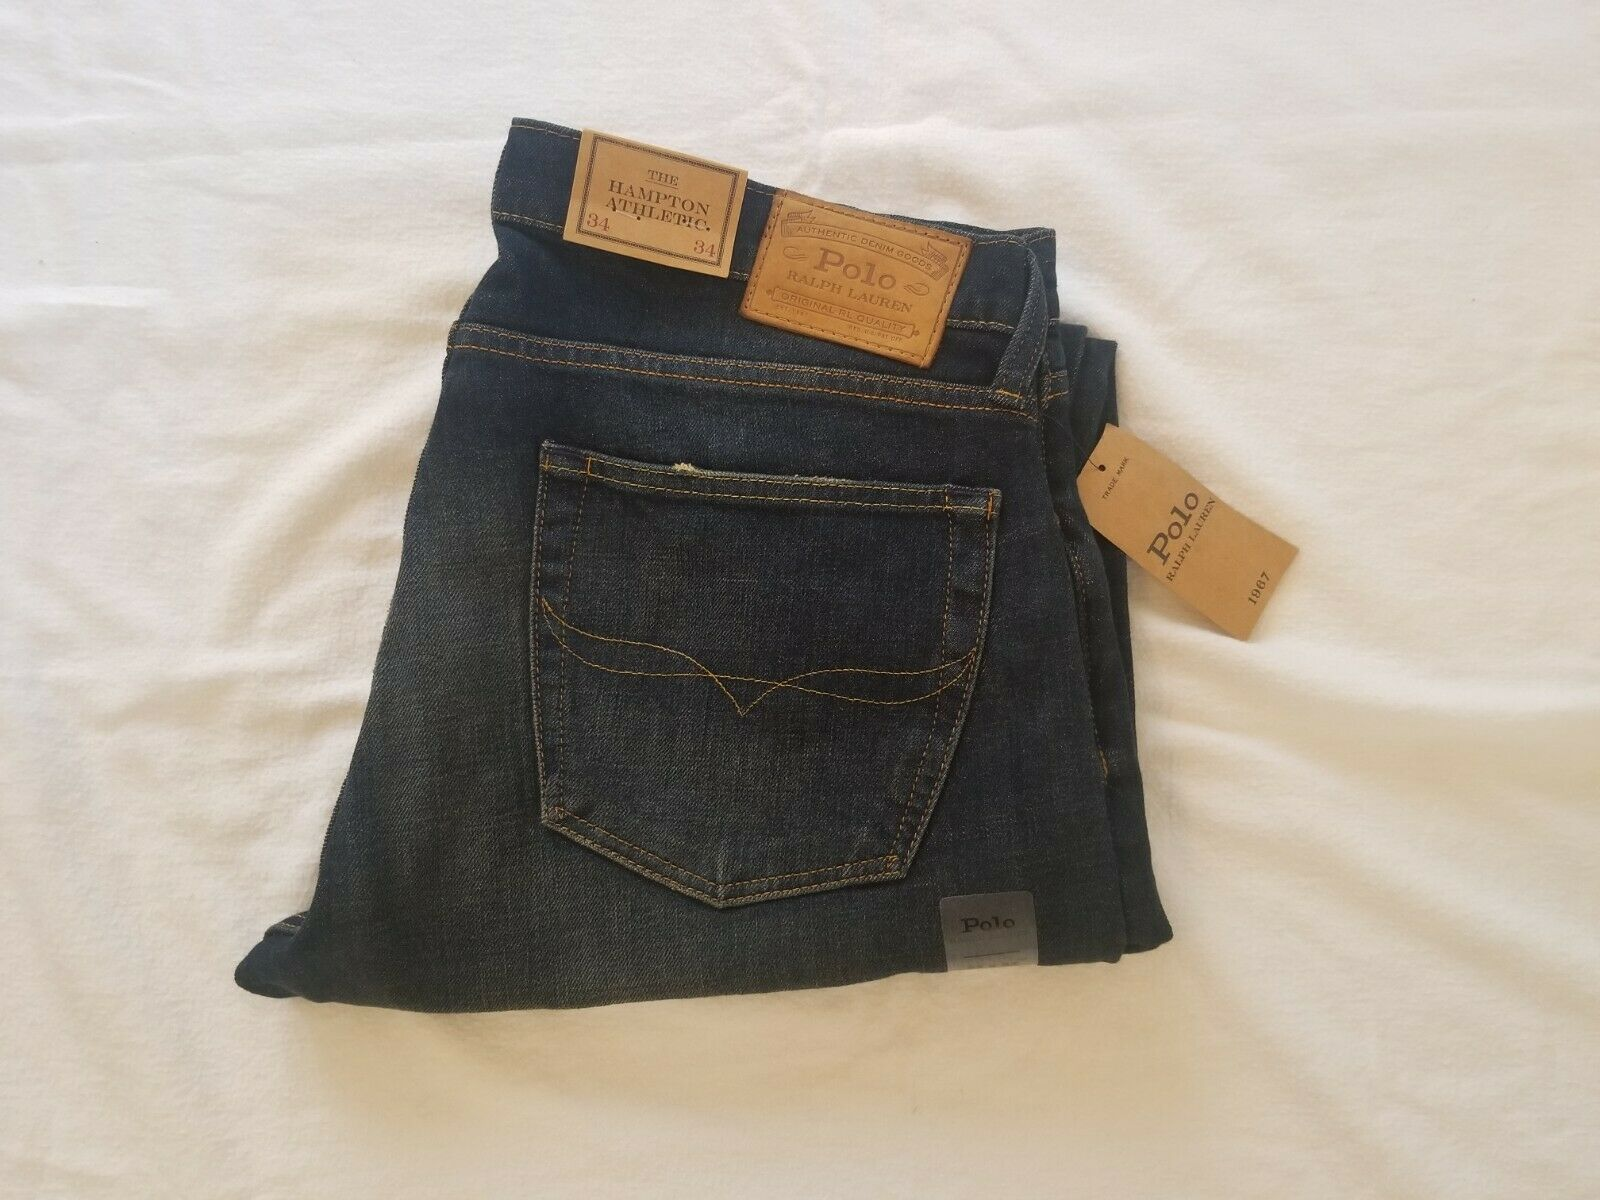 Polo Ralph Lauren Genuine Hampton Athletic Jeans  Brand New  Very Good Quality